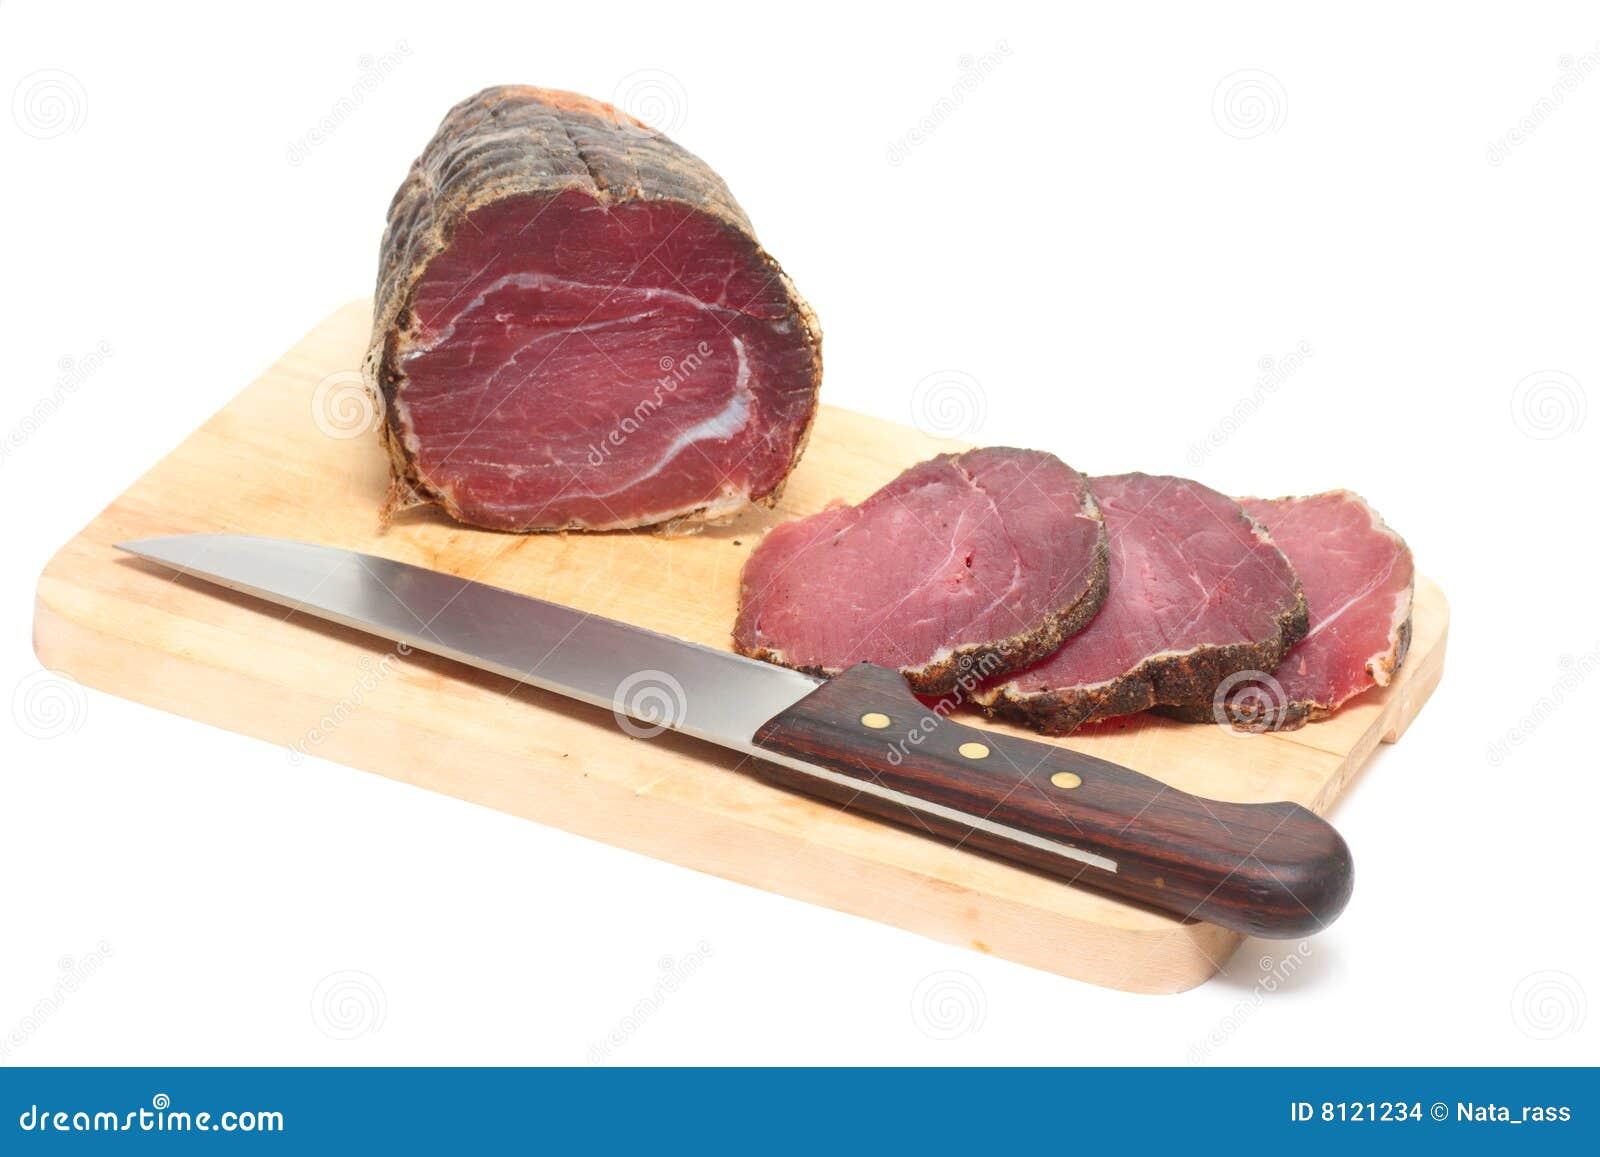 how to cut pork shoulder in half